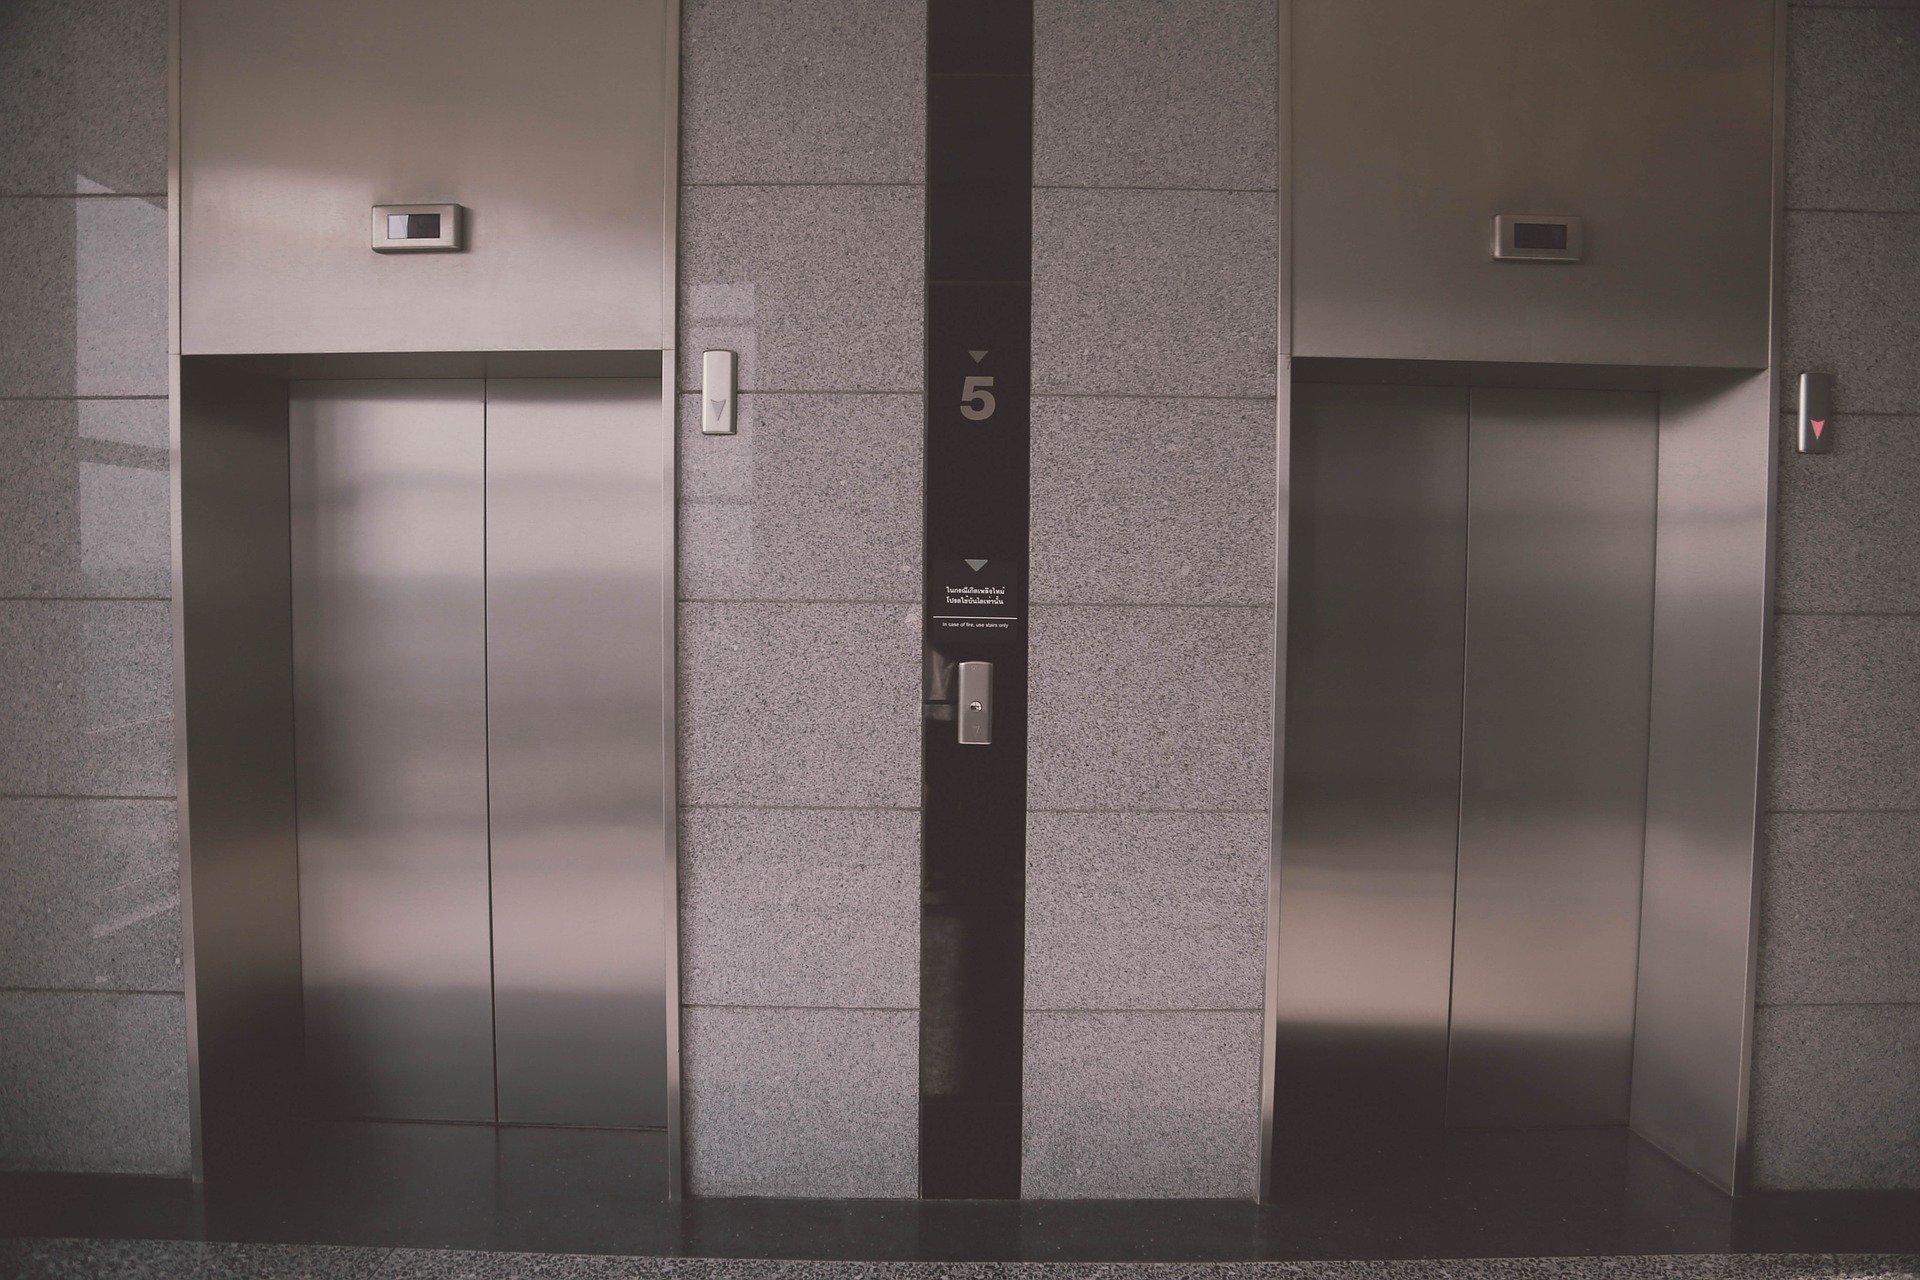 Elevatordøre